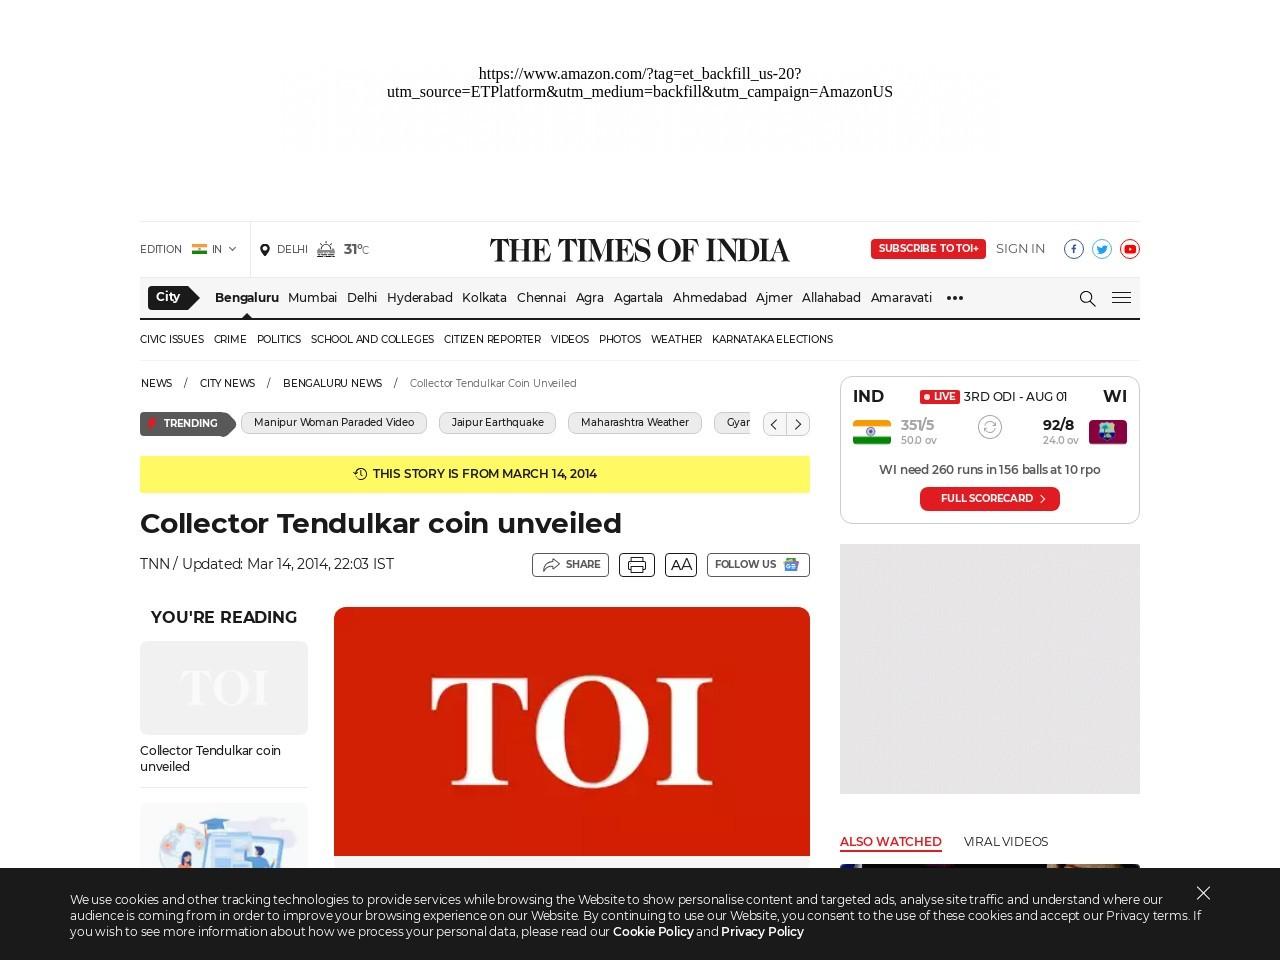 Collector Tendulkar coin unveiled